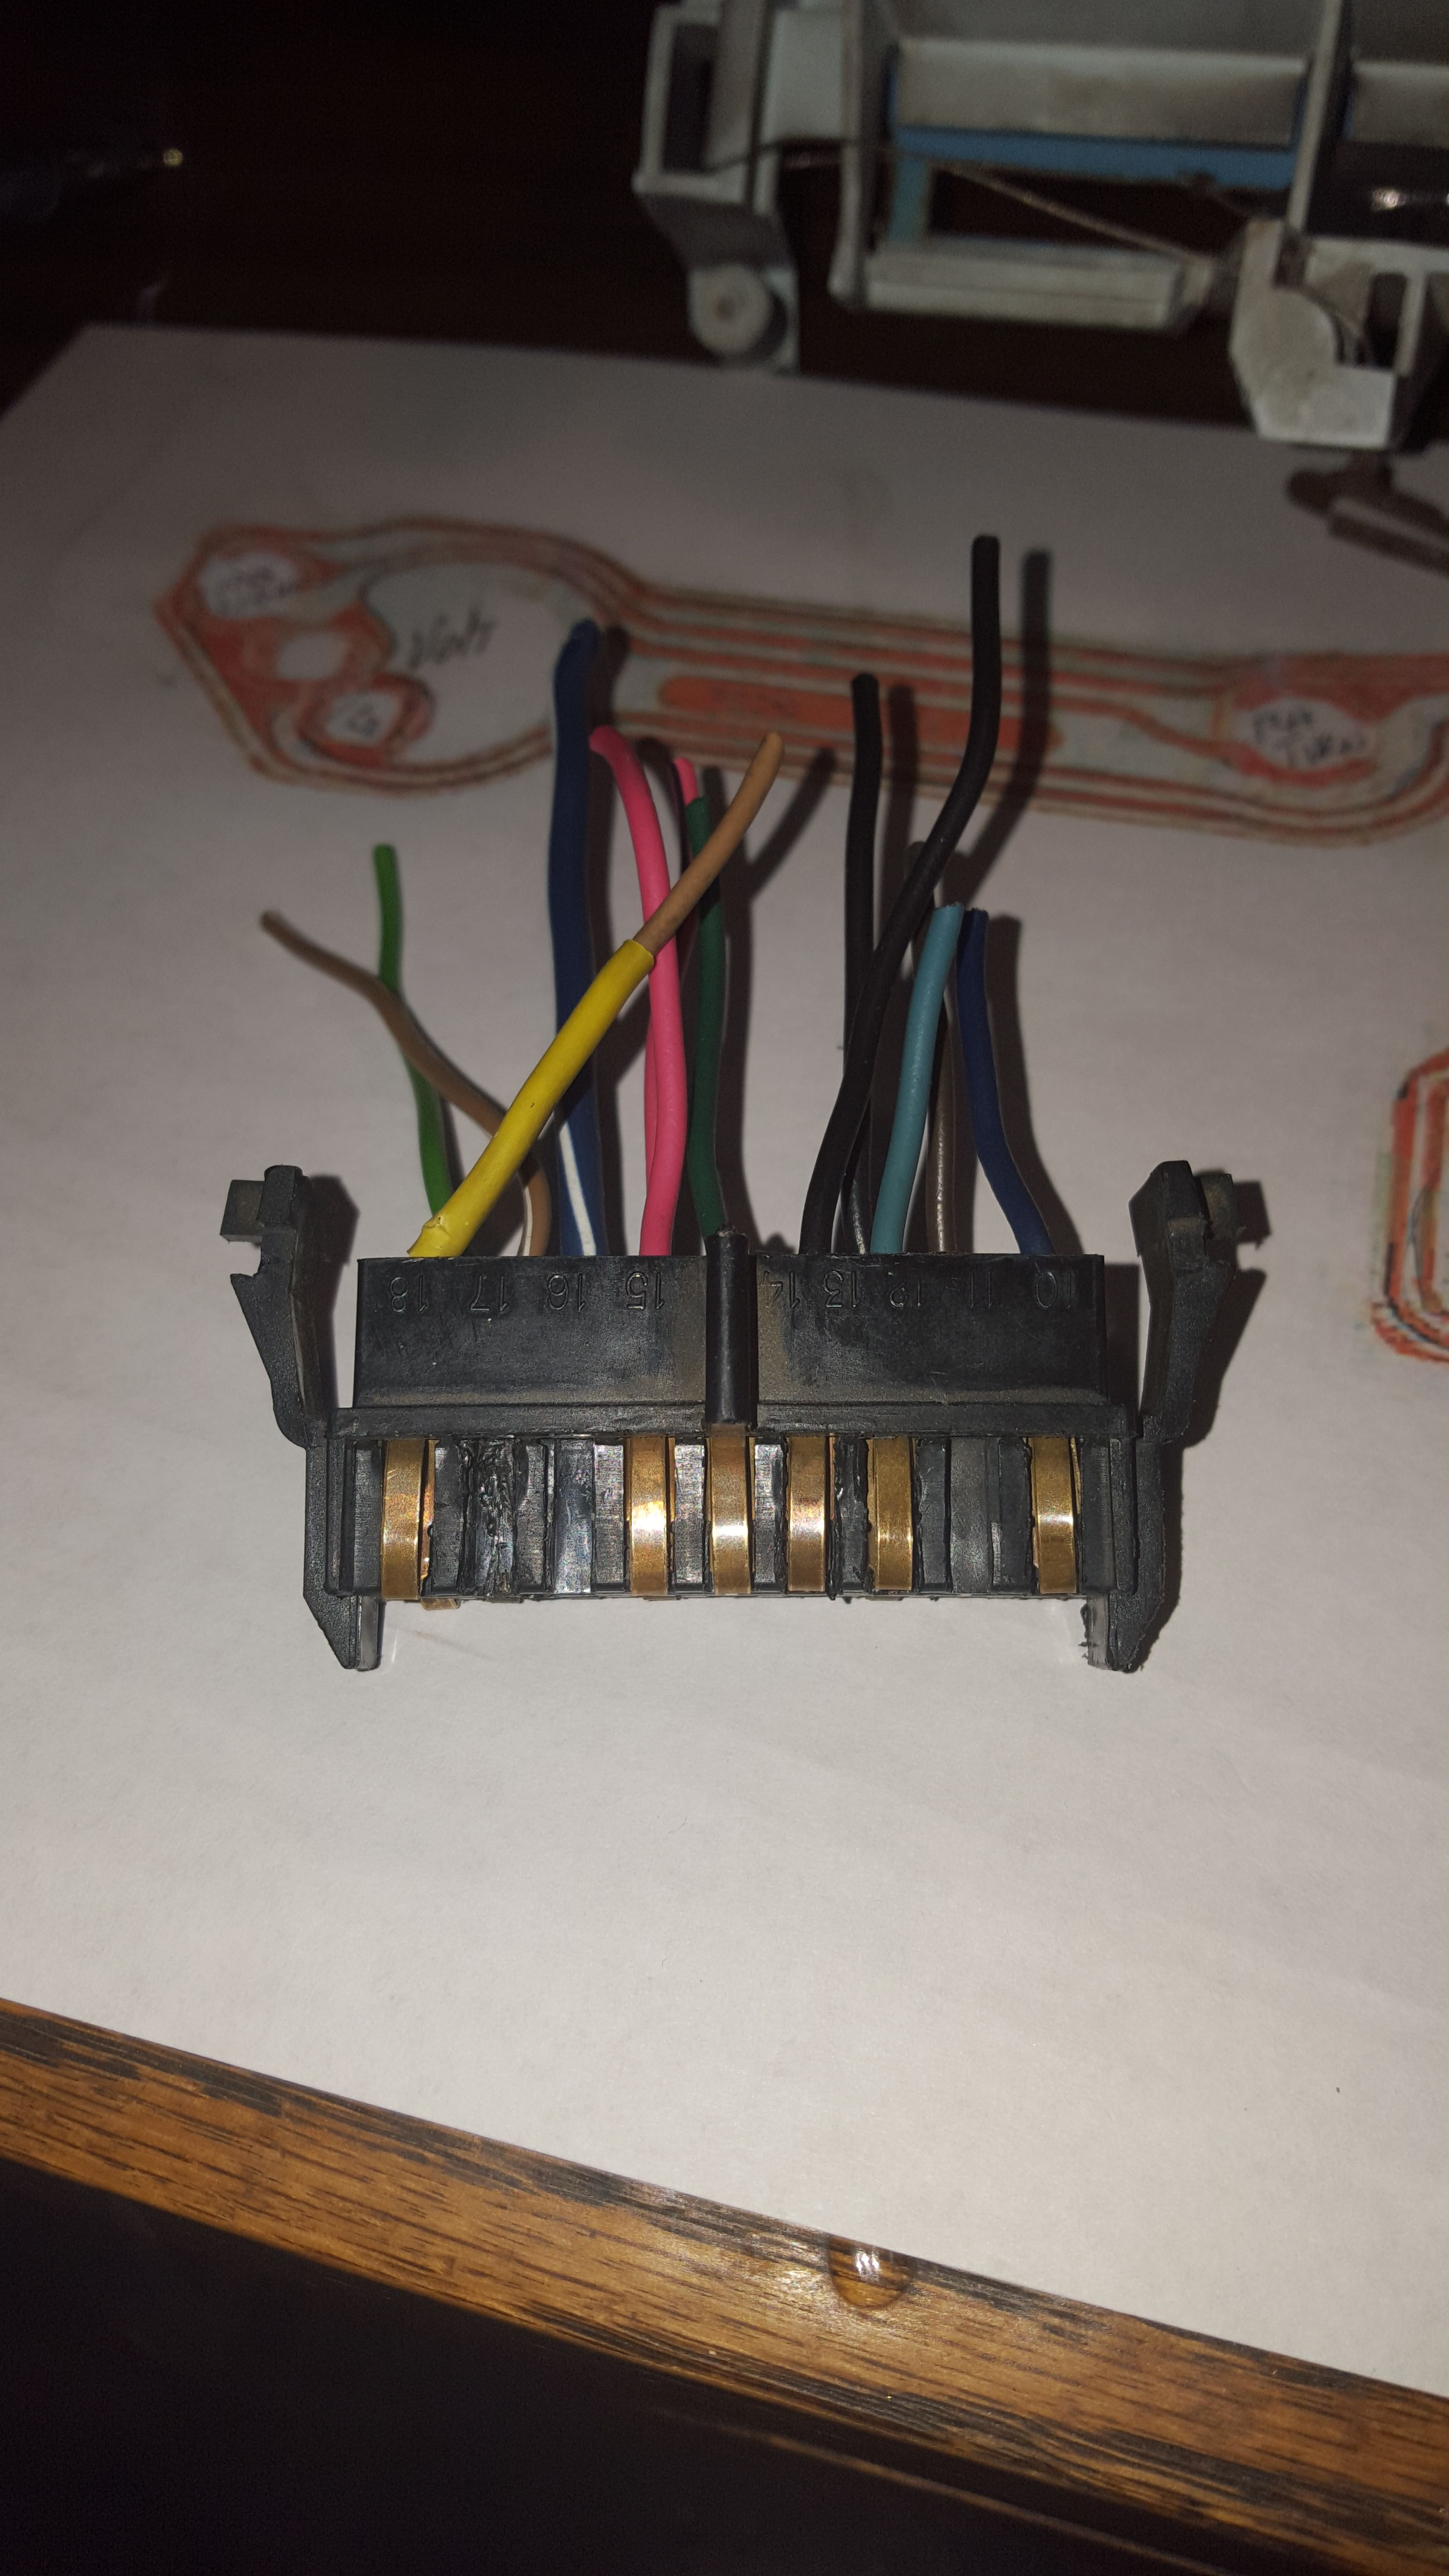 pin connector.jpg